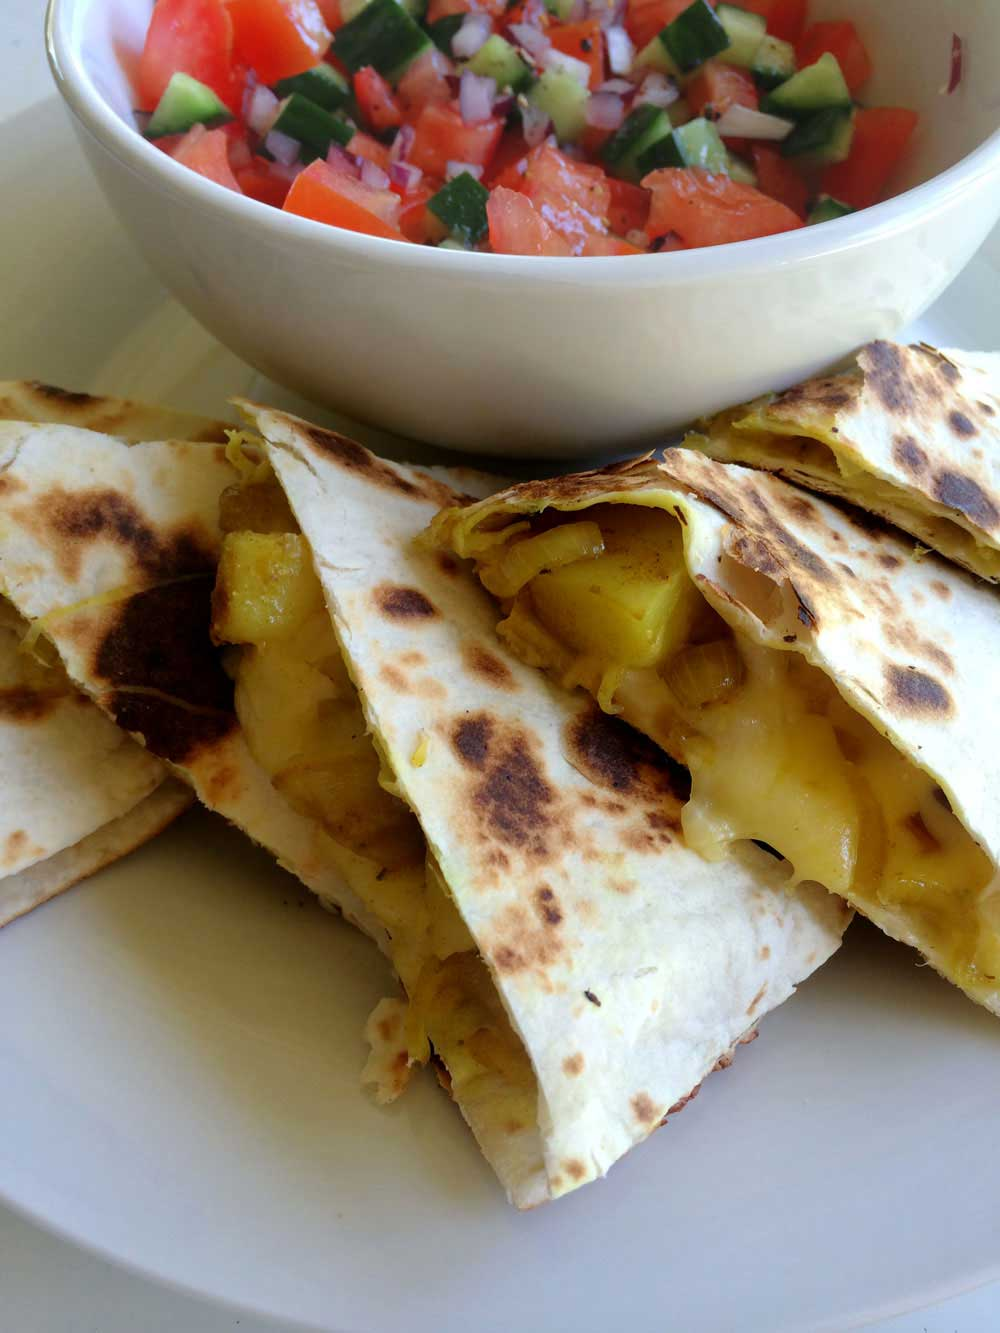 Cumin Spiced Potato Quesadillas. With a Tomato and Cucumber Salsa